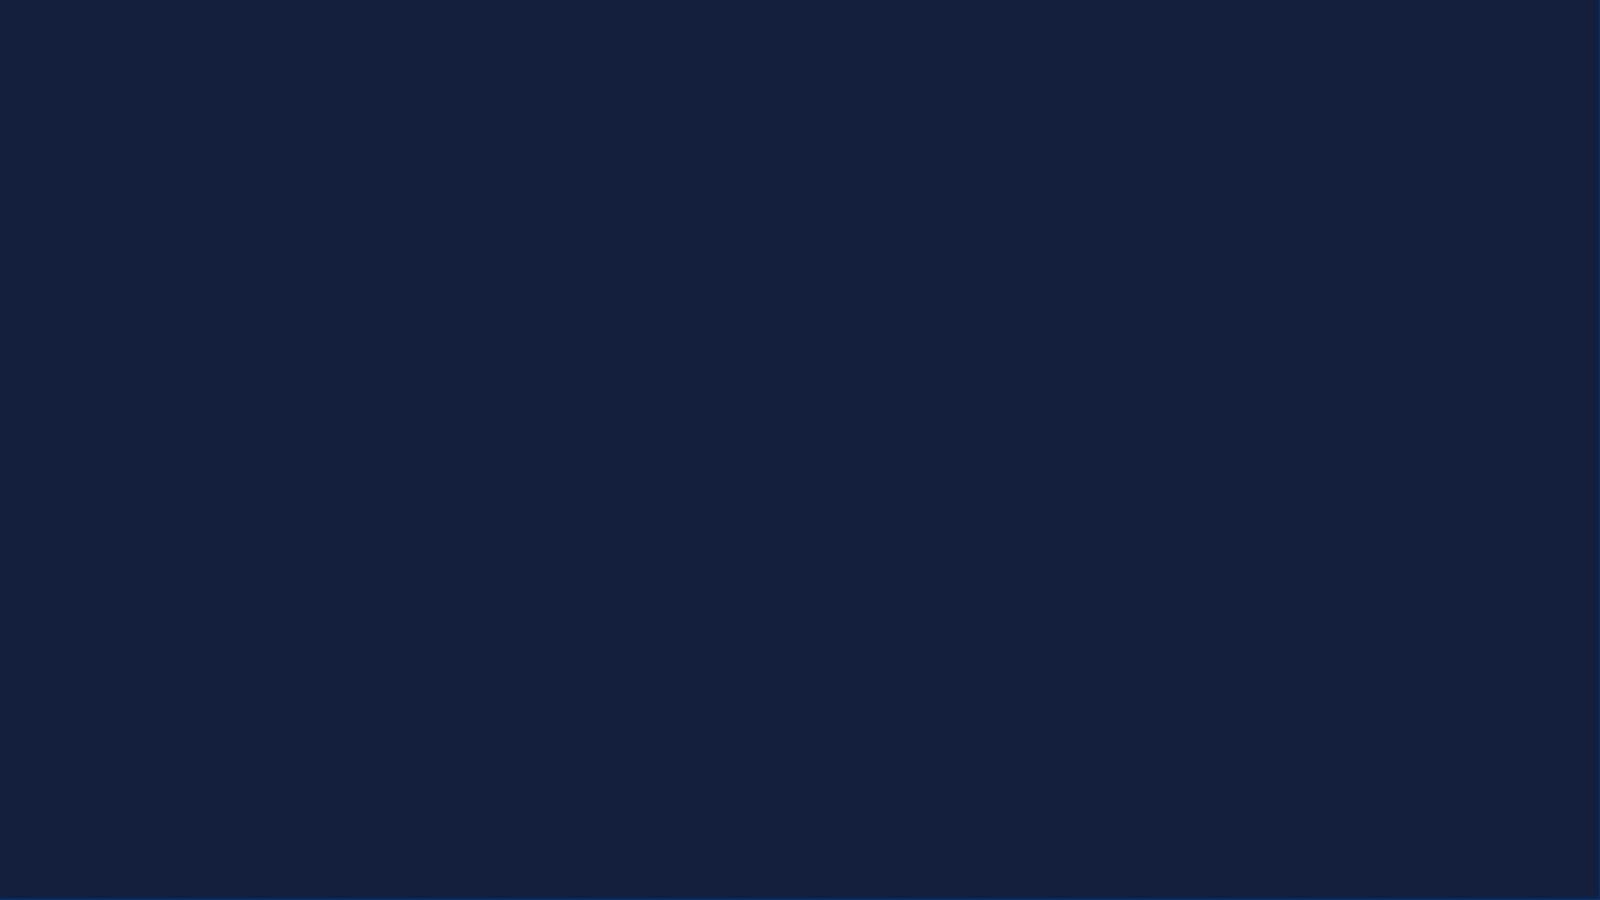 Terms Of Use >> 2a52379279fa83bc3c1d37f3a532abe2_navy-blue-backgrounds-navy-blue-text-box-clipart_2120-1192 ...